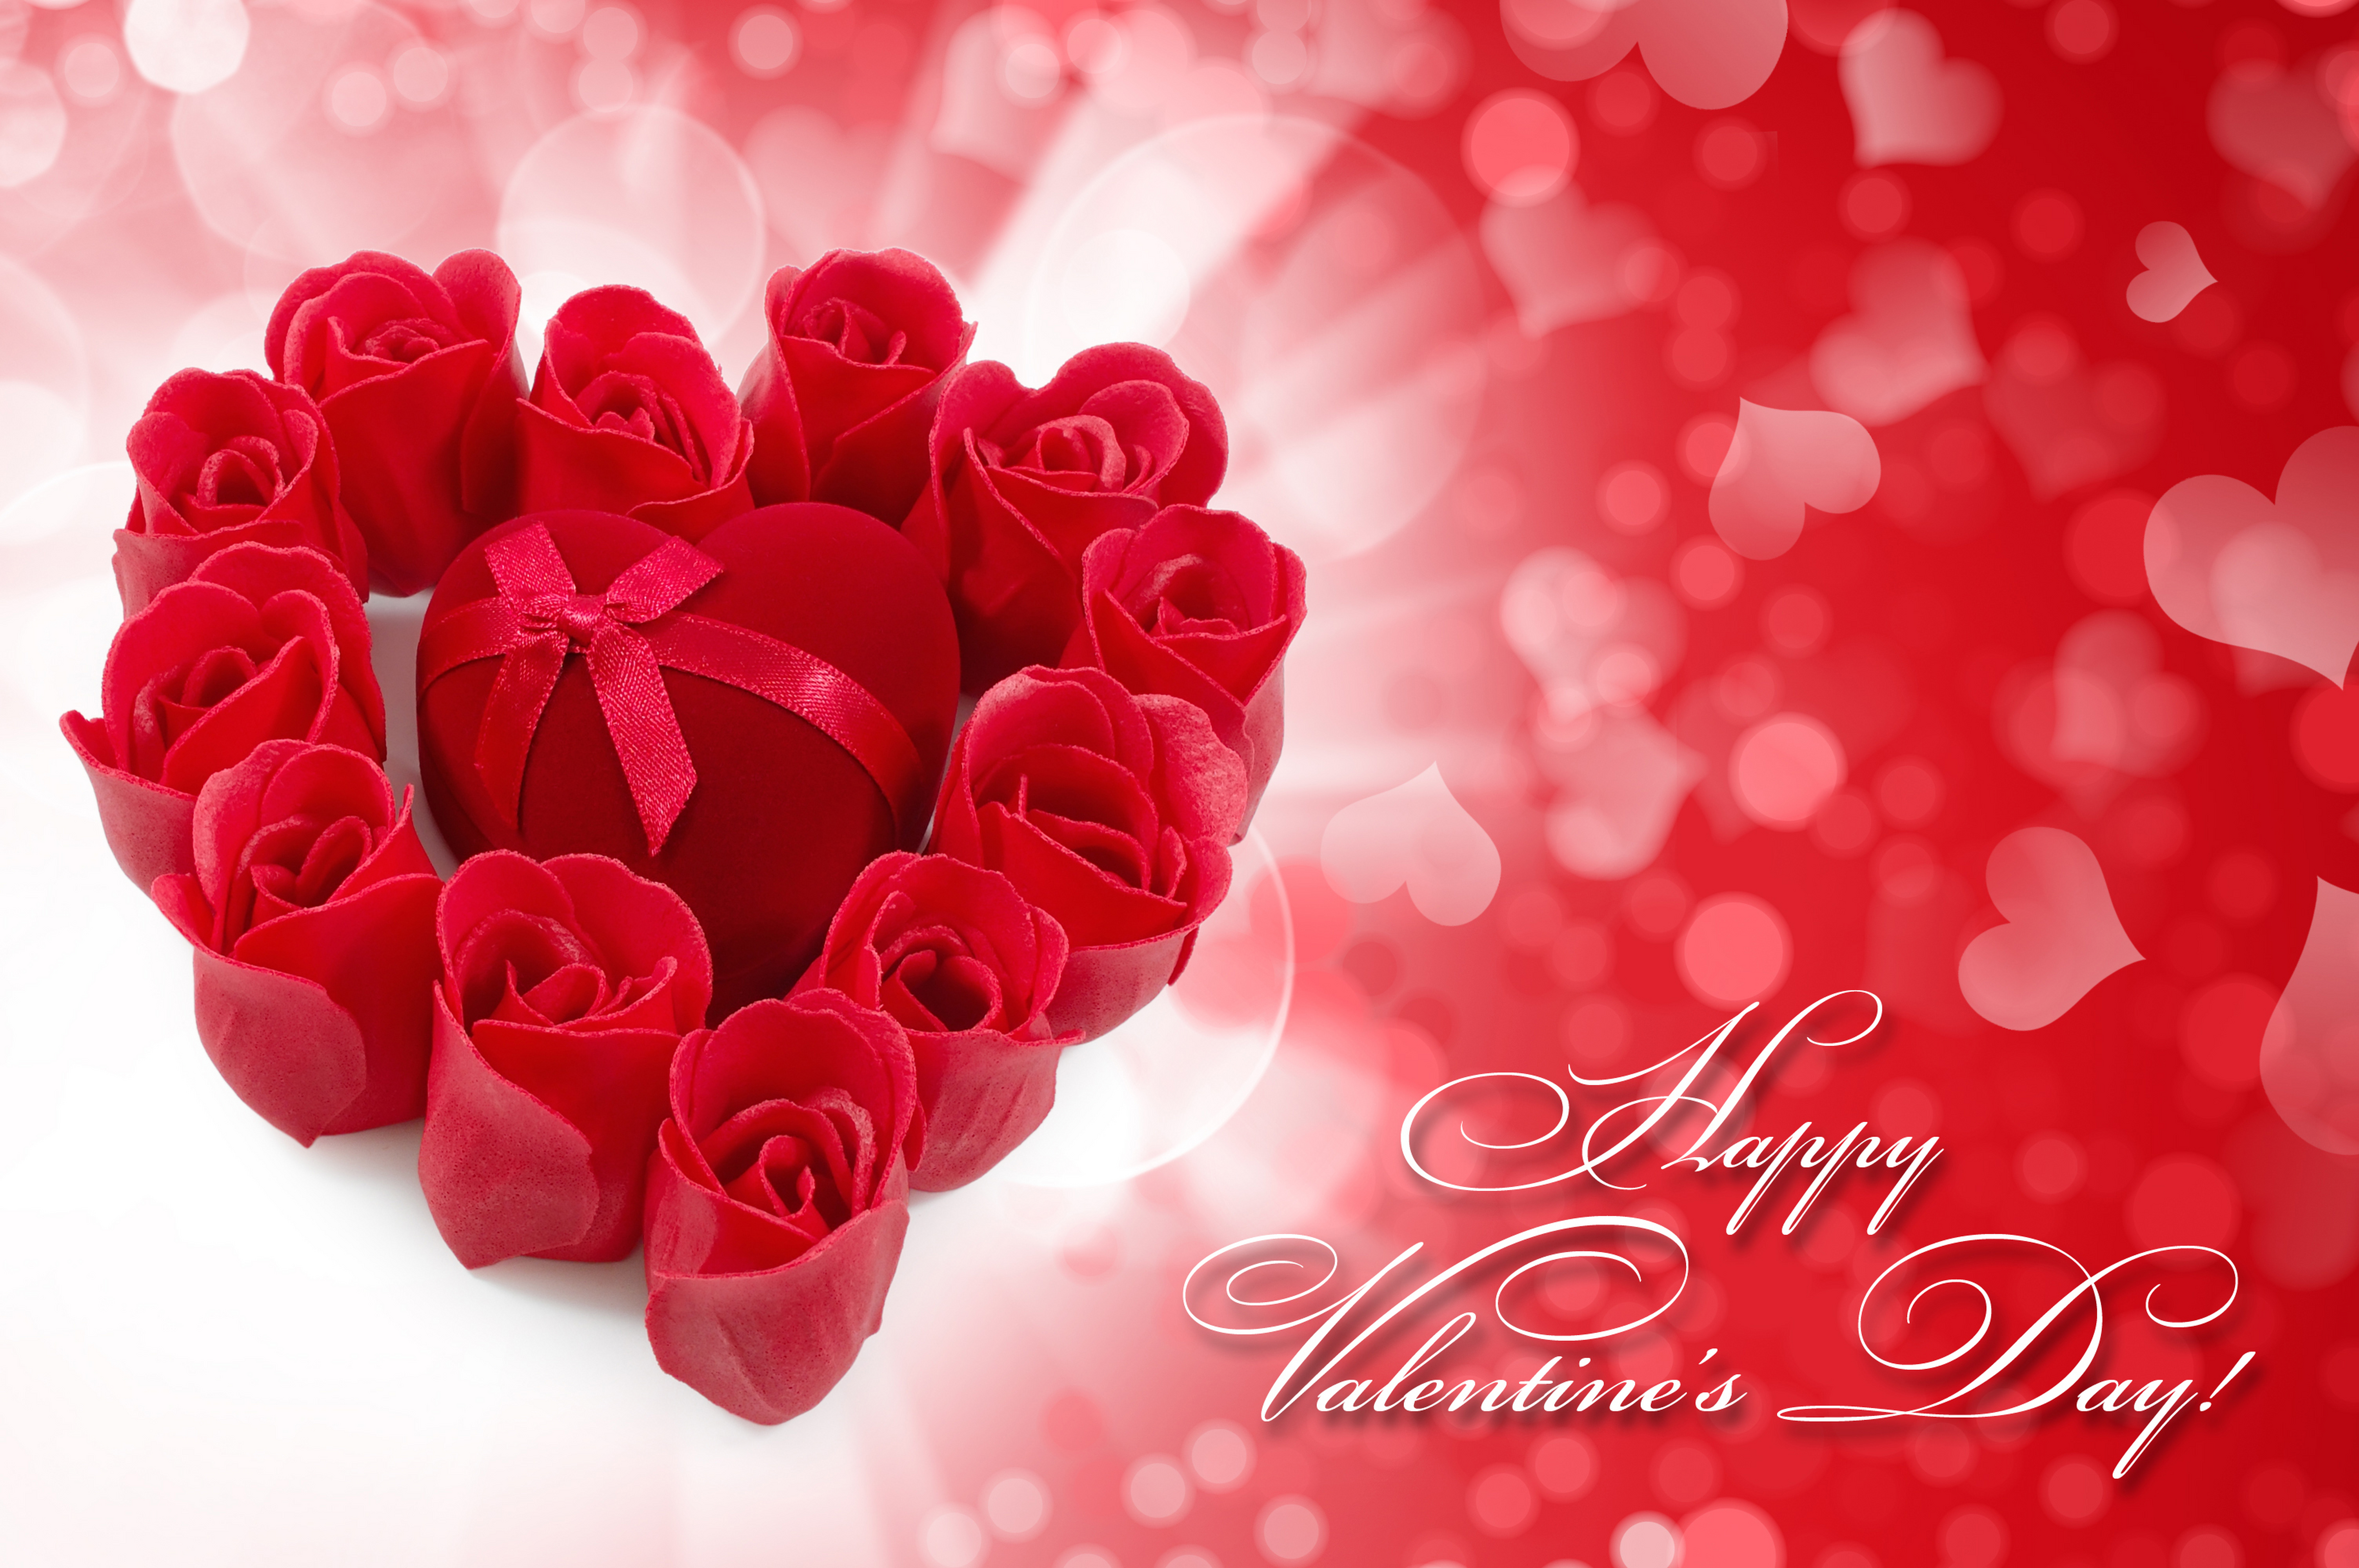 С Днем Святого Валентина 616fff710fbf